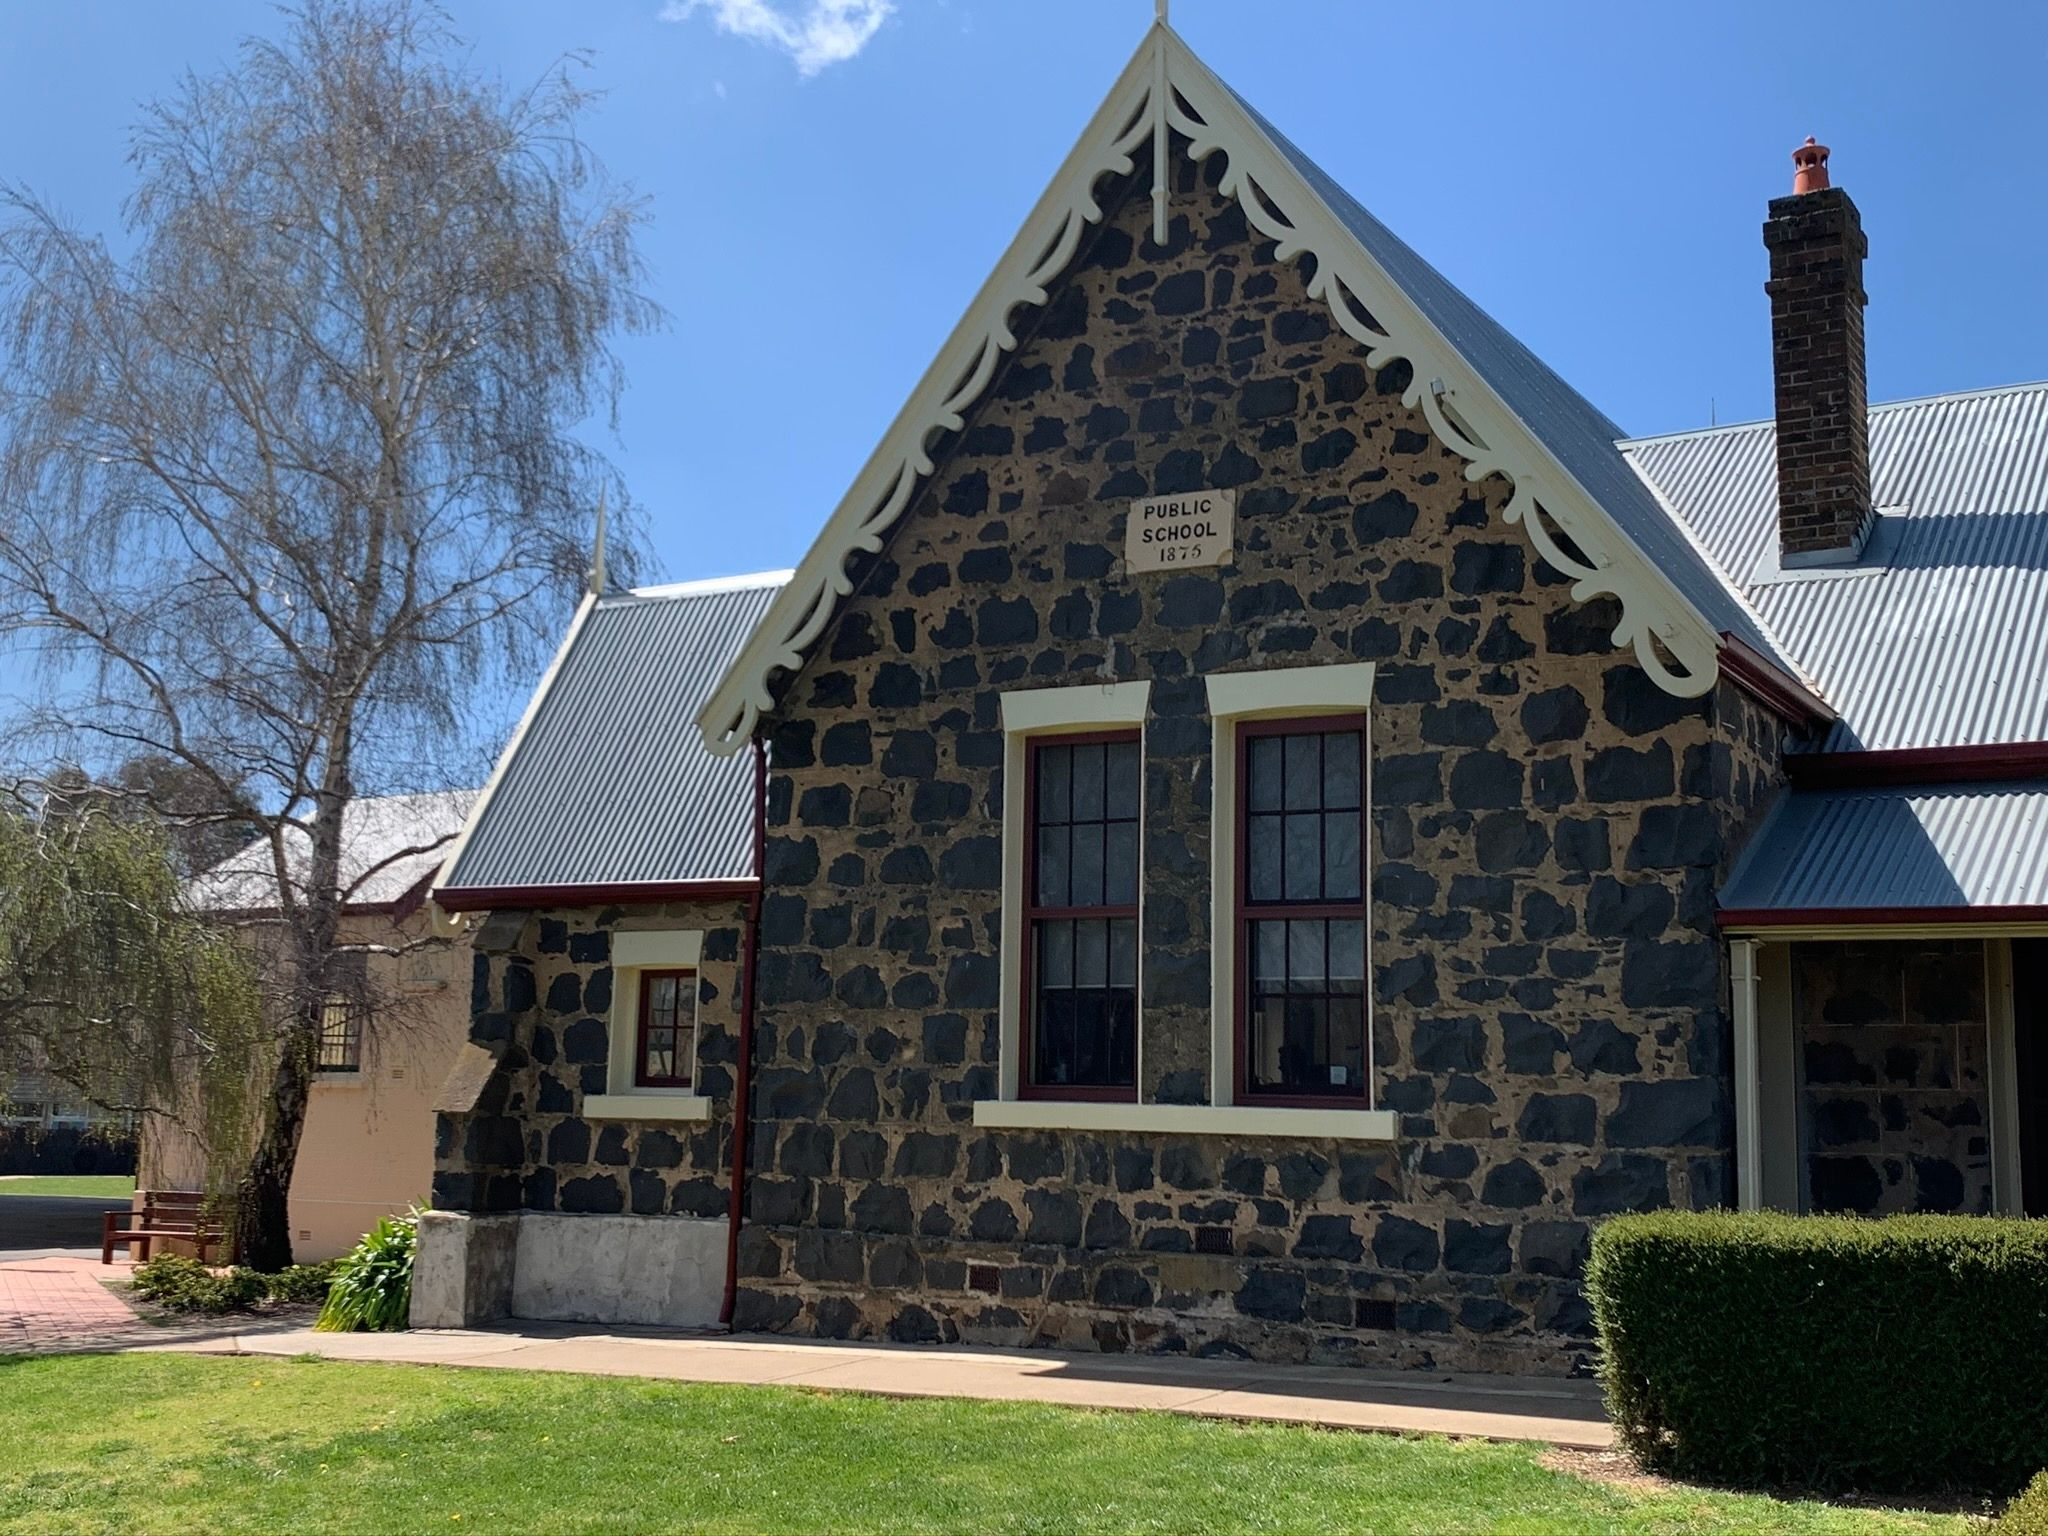 bluestone building in Millthorpe